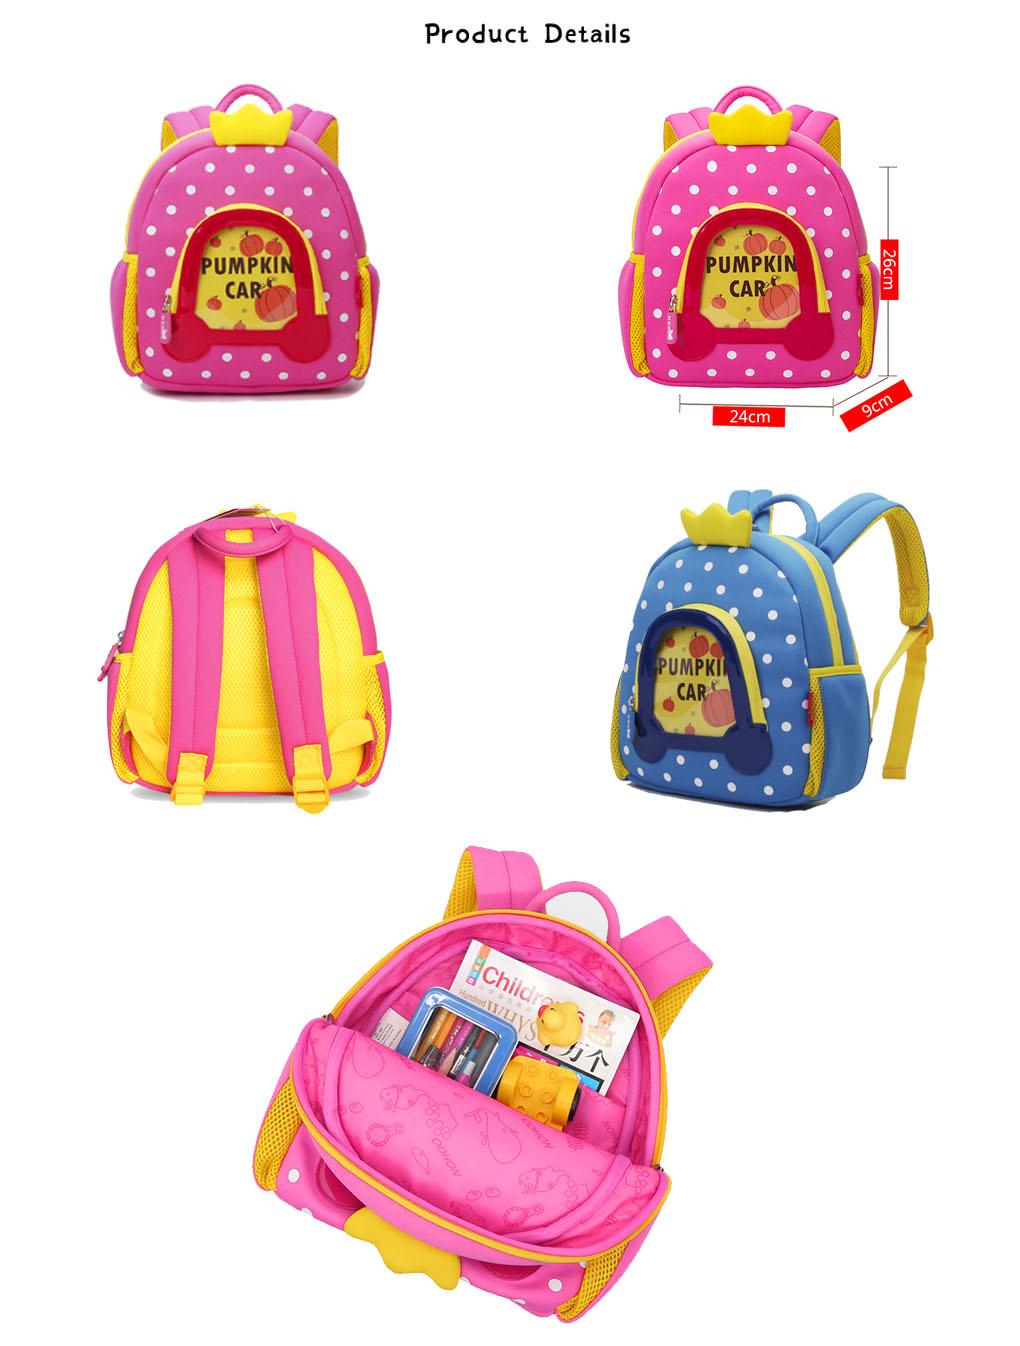 Nohoo Children Products-Lovely Design Cartoon Kids Backpack Neoprene Kindergarten Bag For Girls